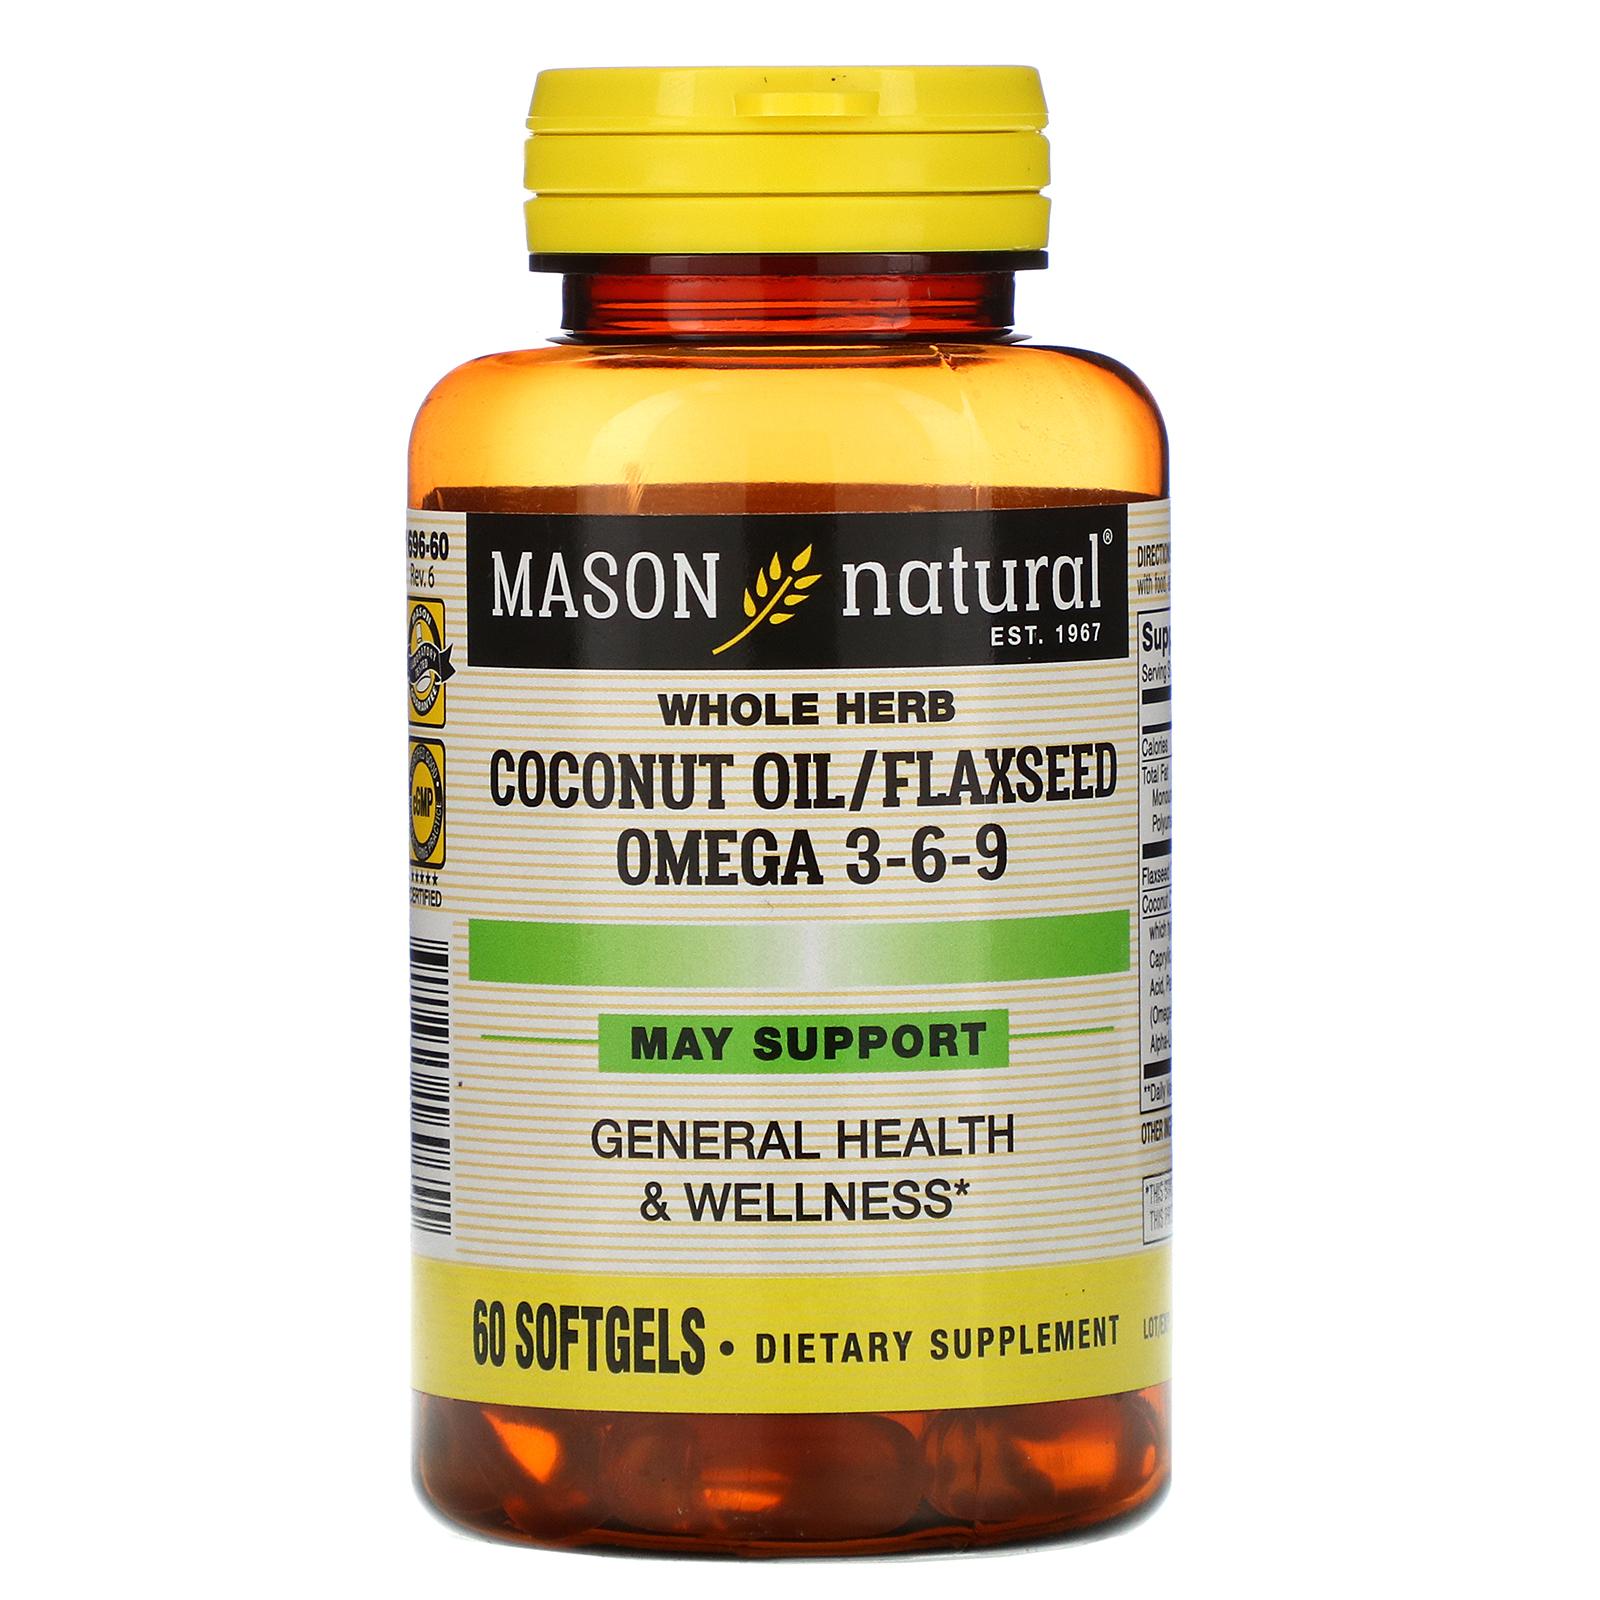 Mason Natural Whole Herb Coconut Oil Flaxseed Omega 3 6 9 60 Softgels Iherb